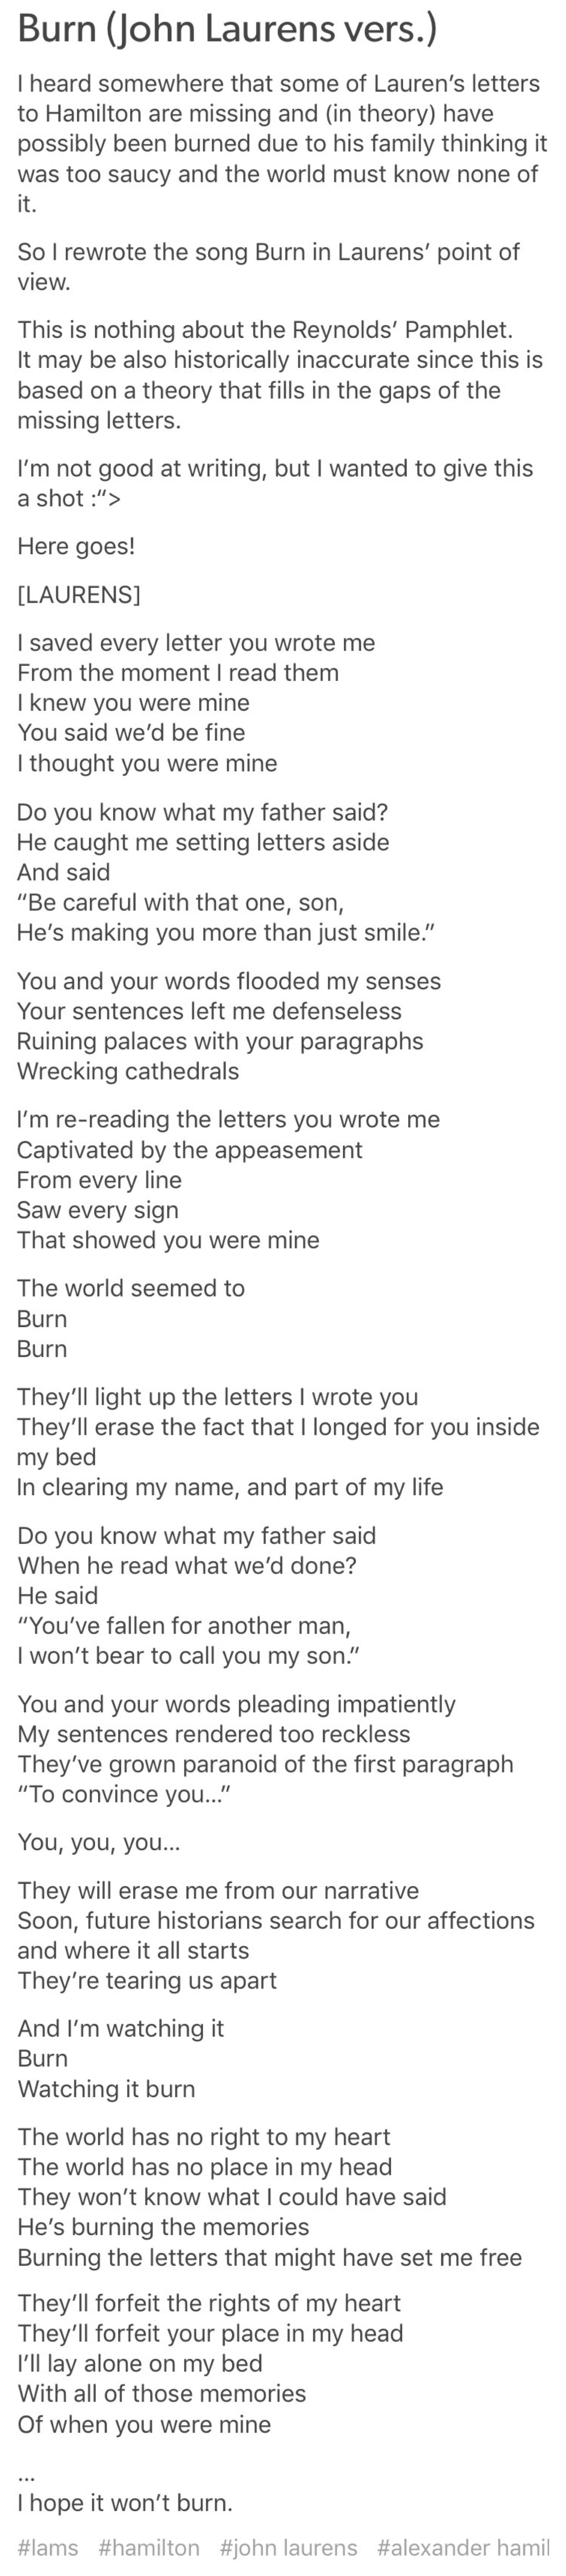 """Burn"" John Laurens Version. John Laurens, Alexander Hamilton, Hamilton, Lams"